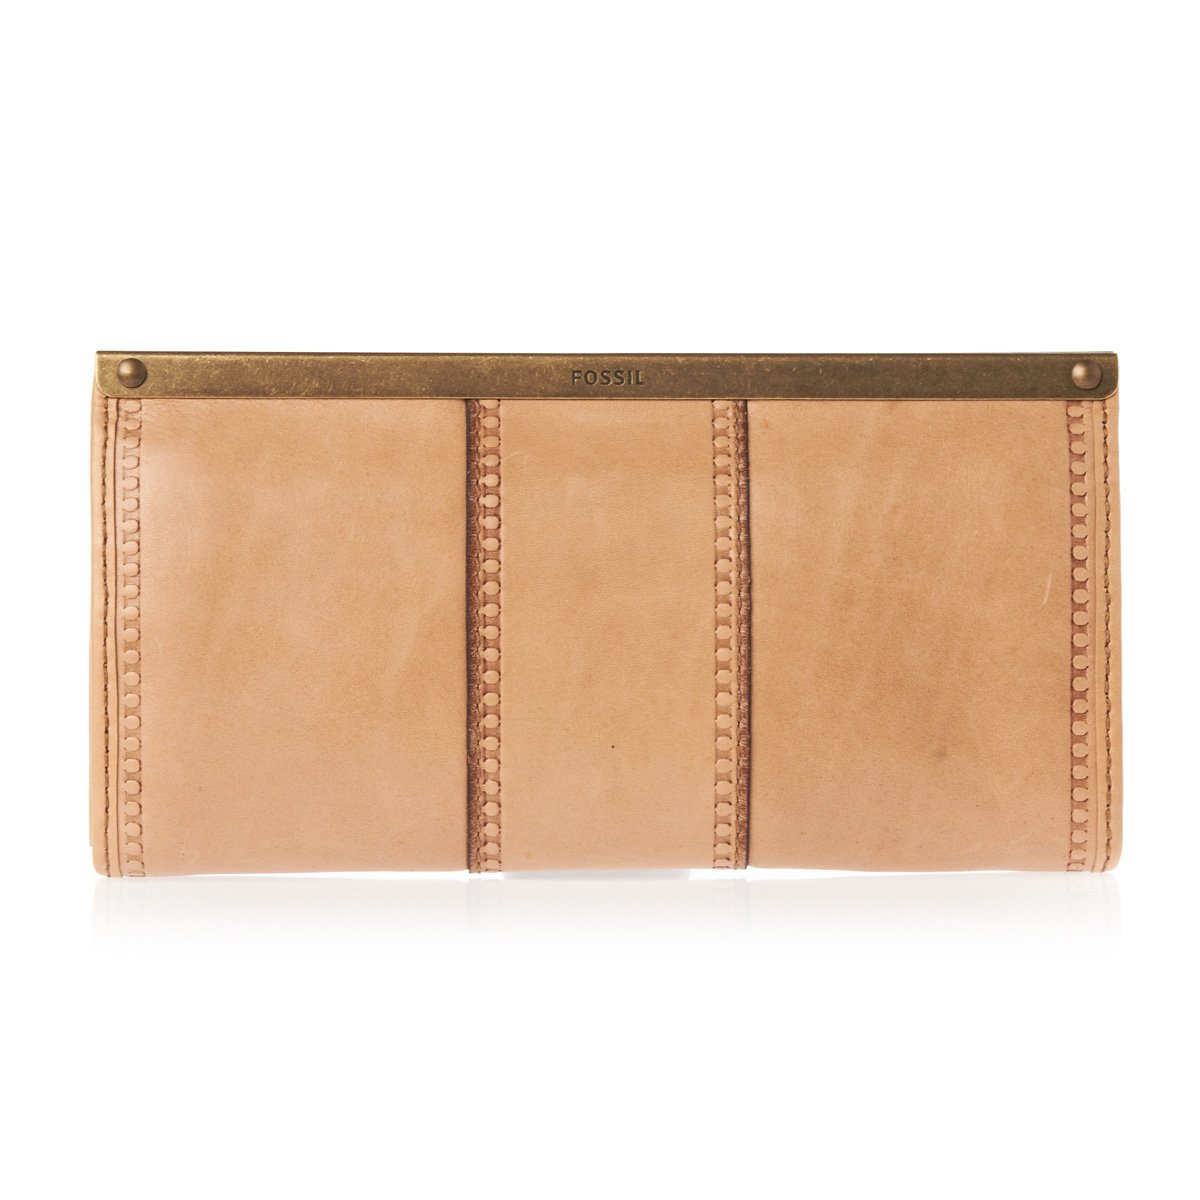 2f2333c47c2a1 Fossil SL3975 Vintage Revival Frame Clutch Tan  Amazon.co.uk  Shoes   Bags